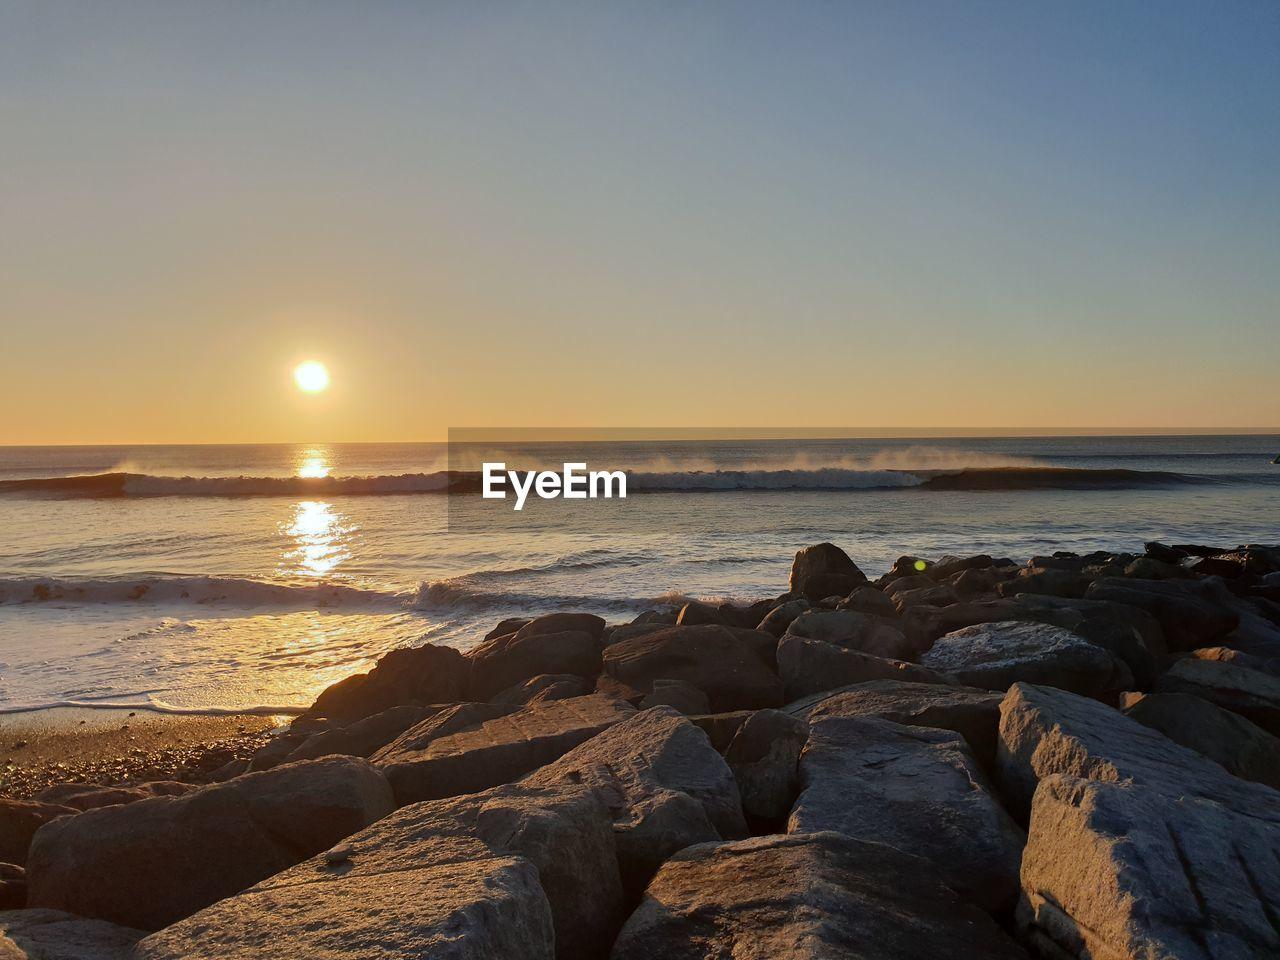 sea, sky, water, rock, beauty in nature, beach, scenics - nature, sunset, rock - object, solid, horizon over water, land, horizon, tranquility, tranquil scene, nature, idyllic, no people, sun, outdoors